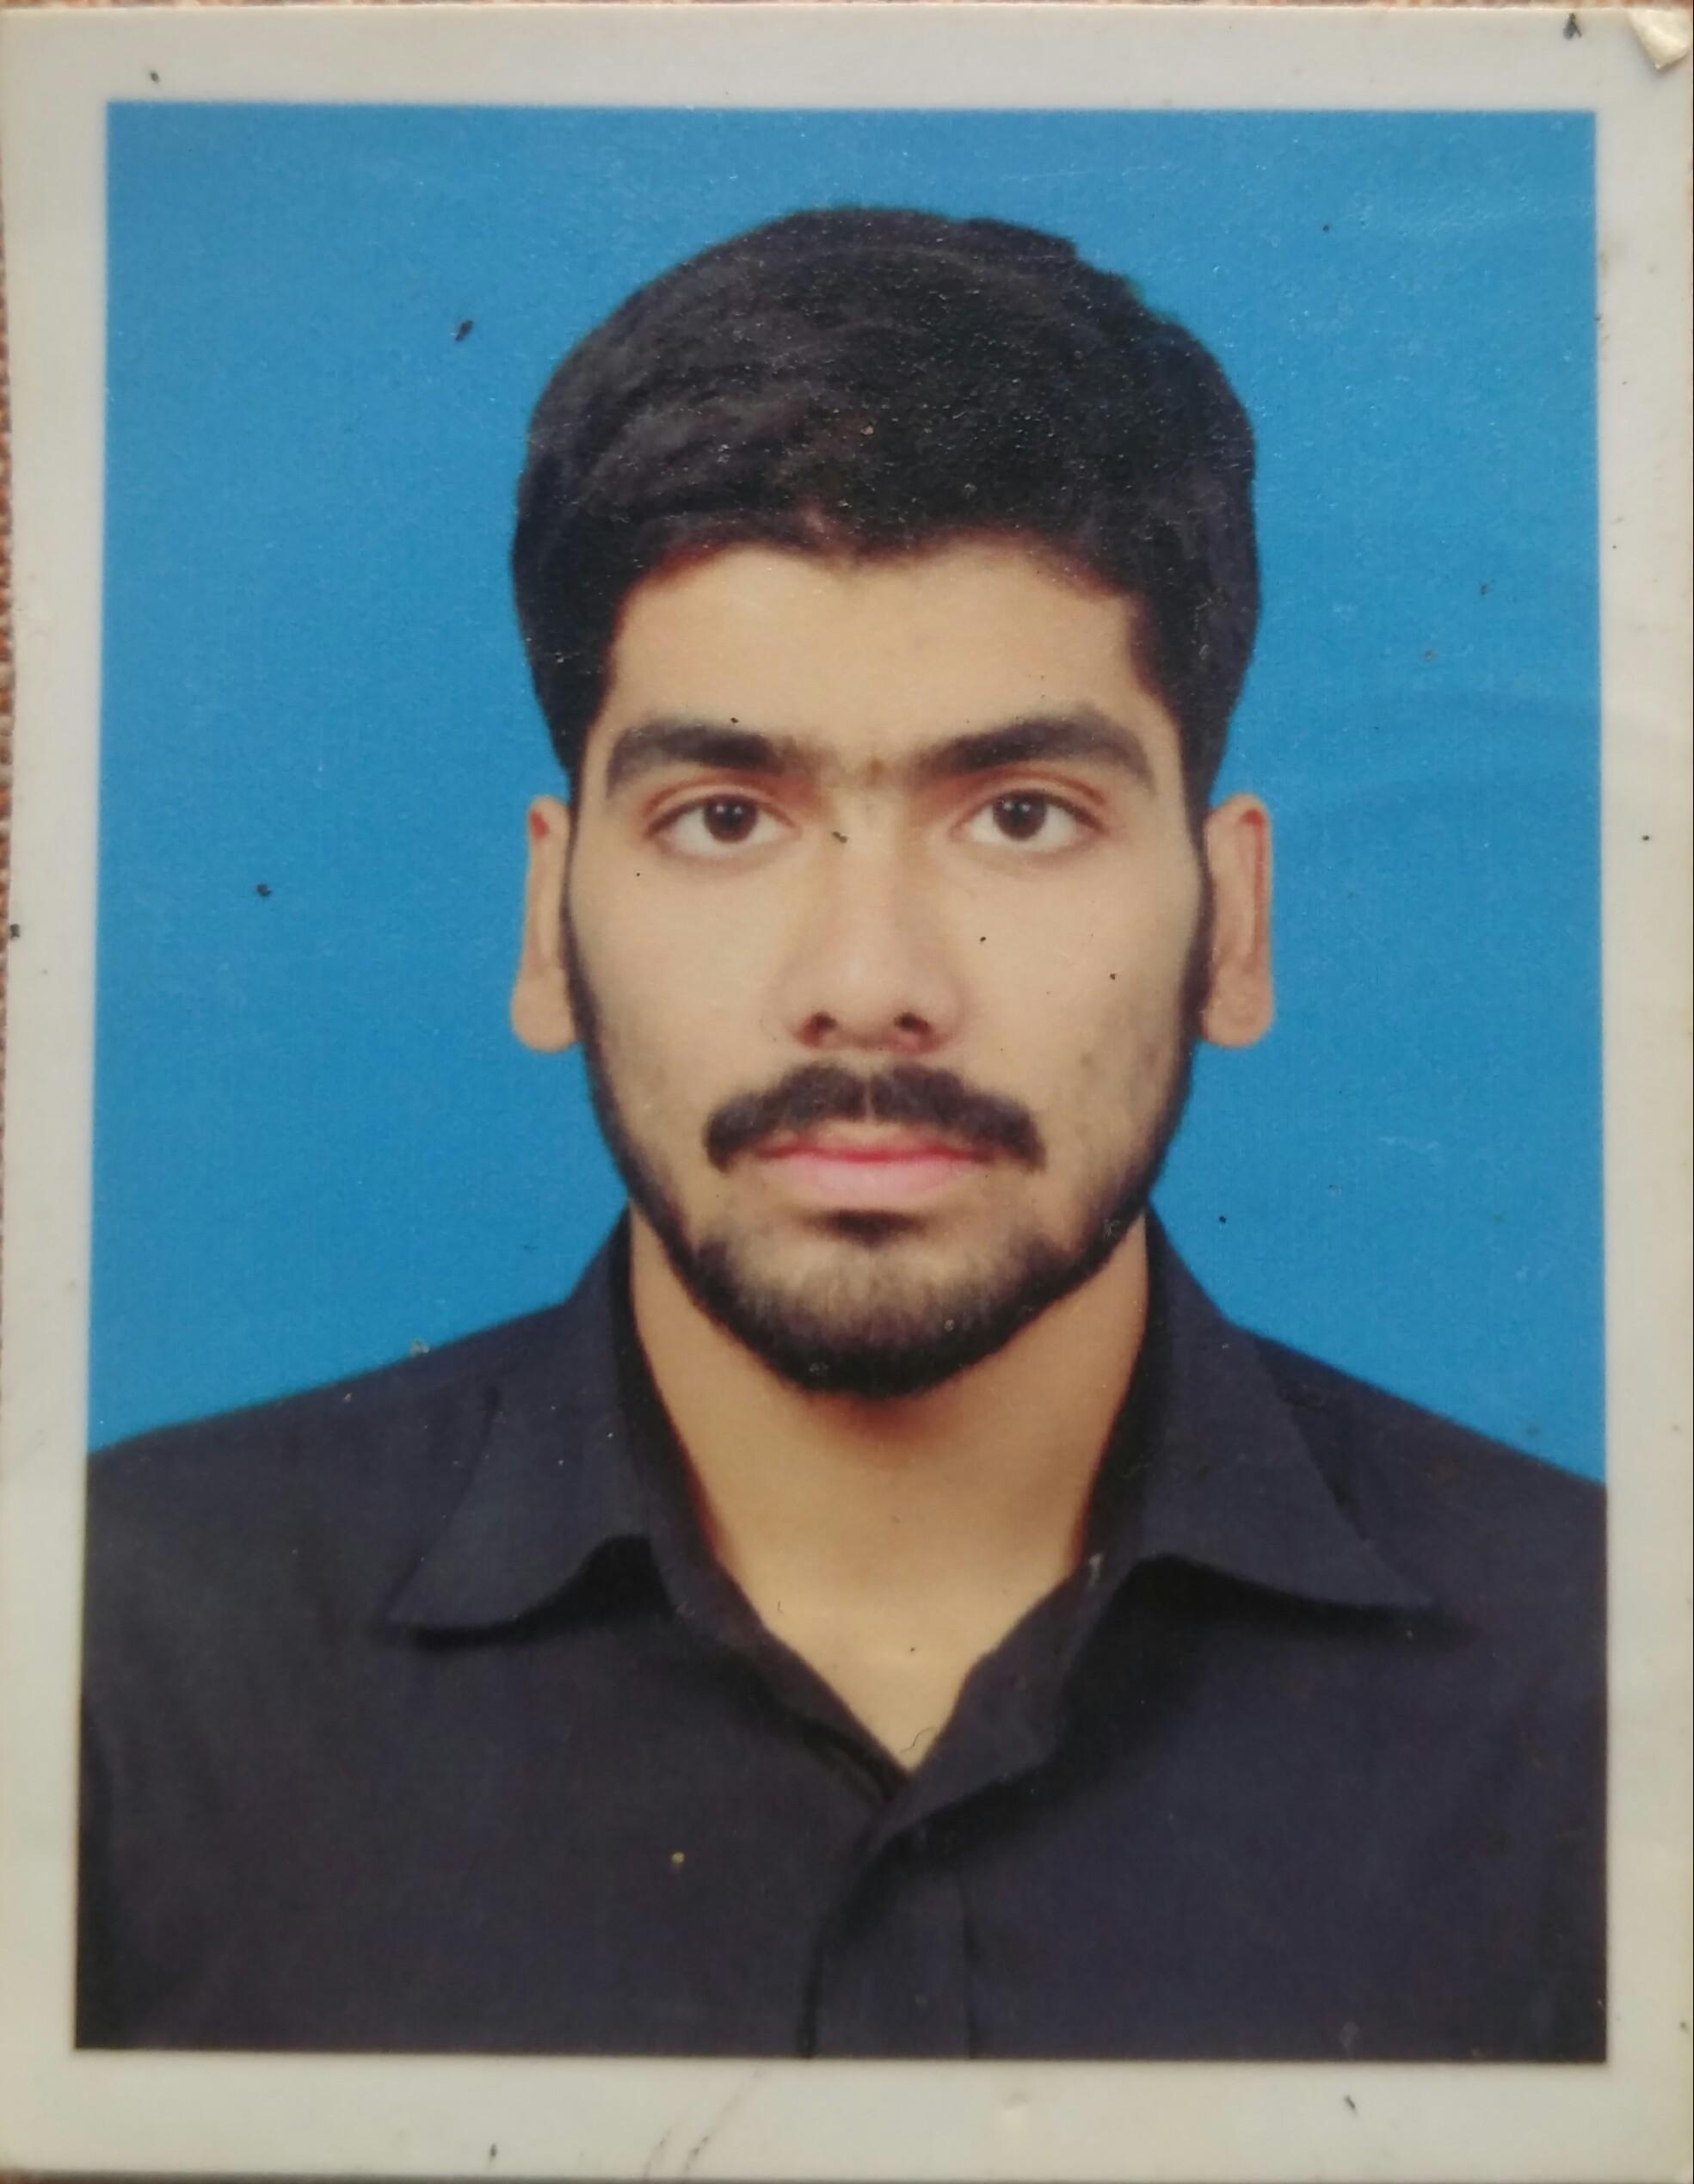 Muhammad Arsalan Mechanical Engineering, Manufacturing Design, LaTeX